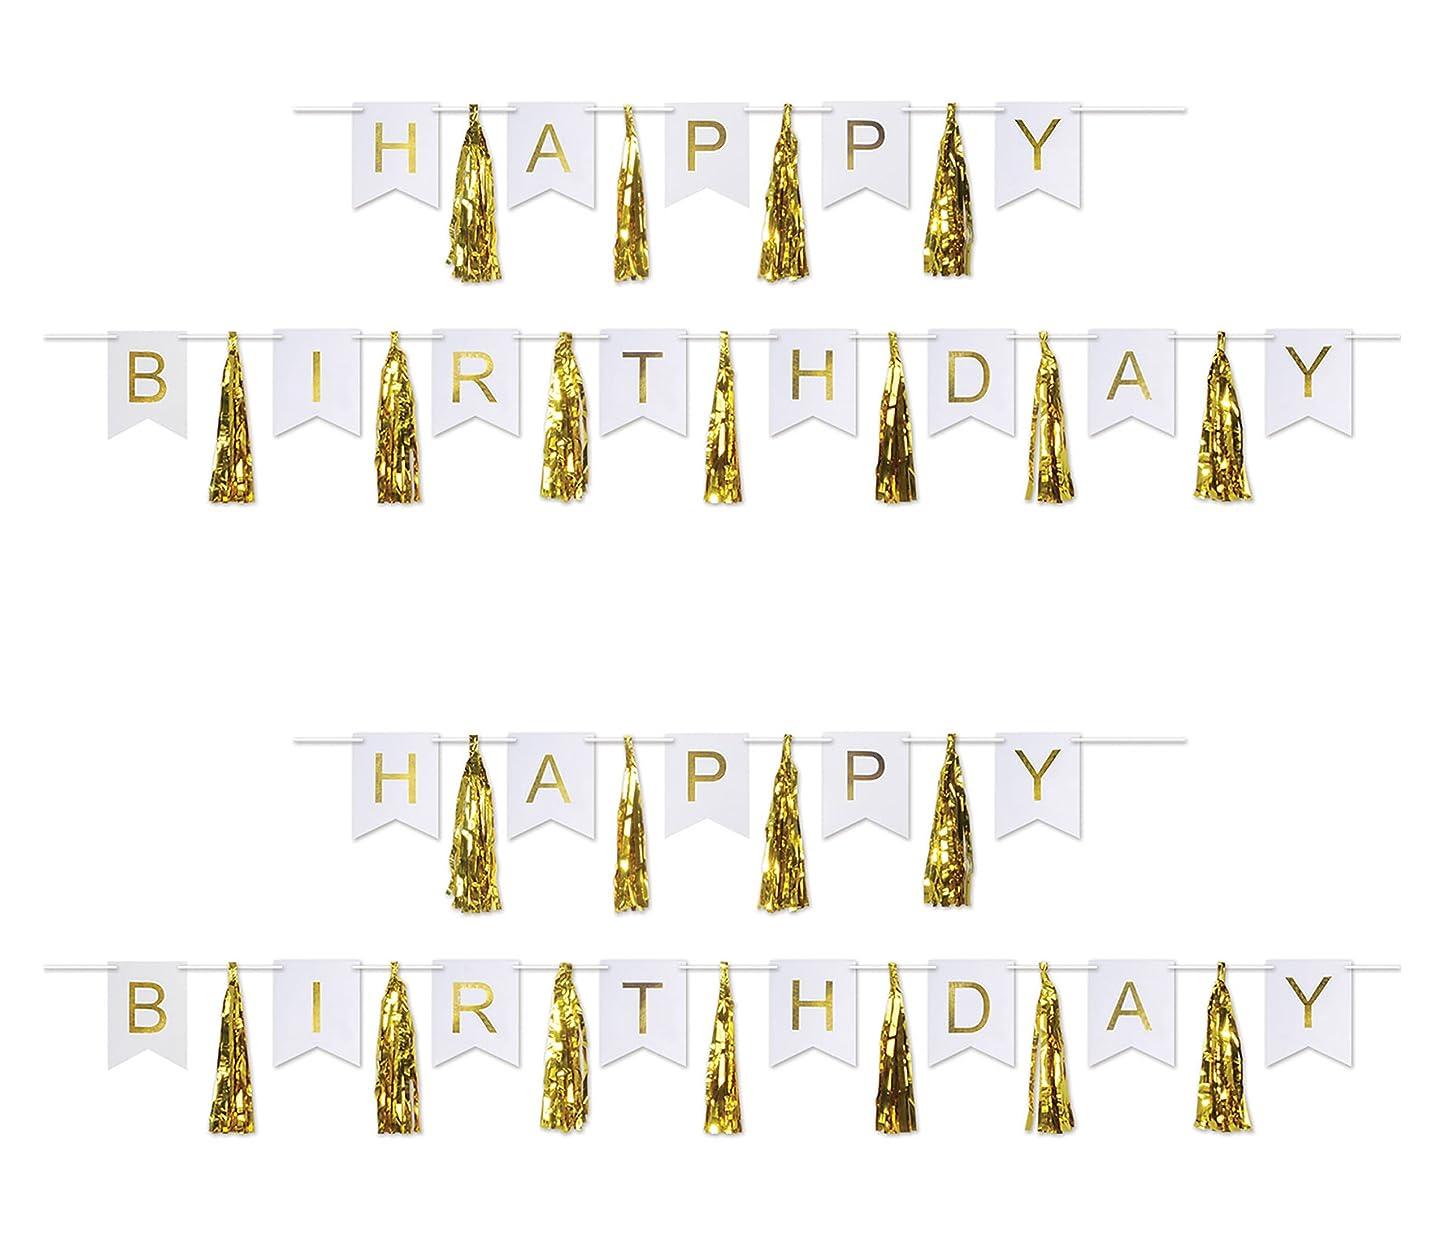 Beistle 59630 birthday tassel streamer Gold/White